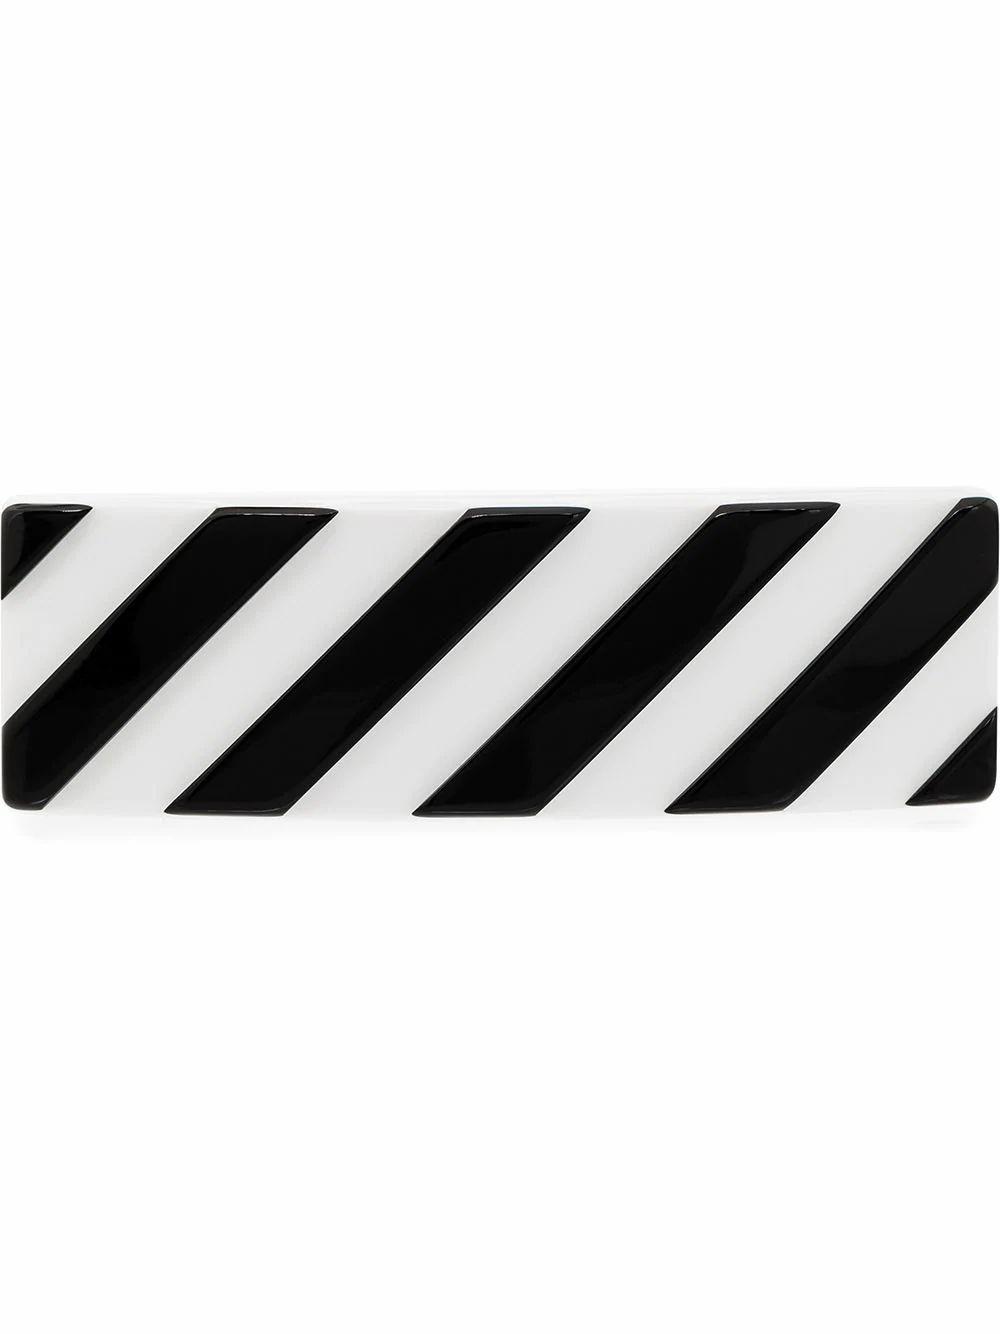 OFF-WHITE WOMEN'S OWZG025S20PLA0010110 WHITE PVC HAIR CLIP